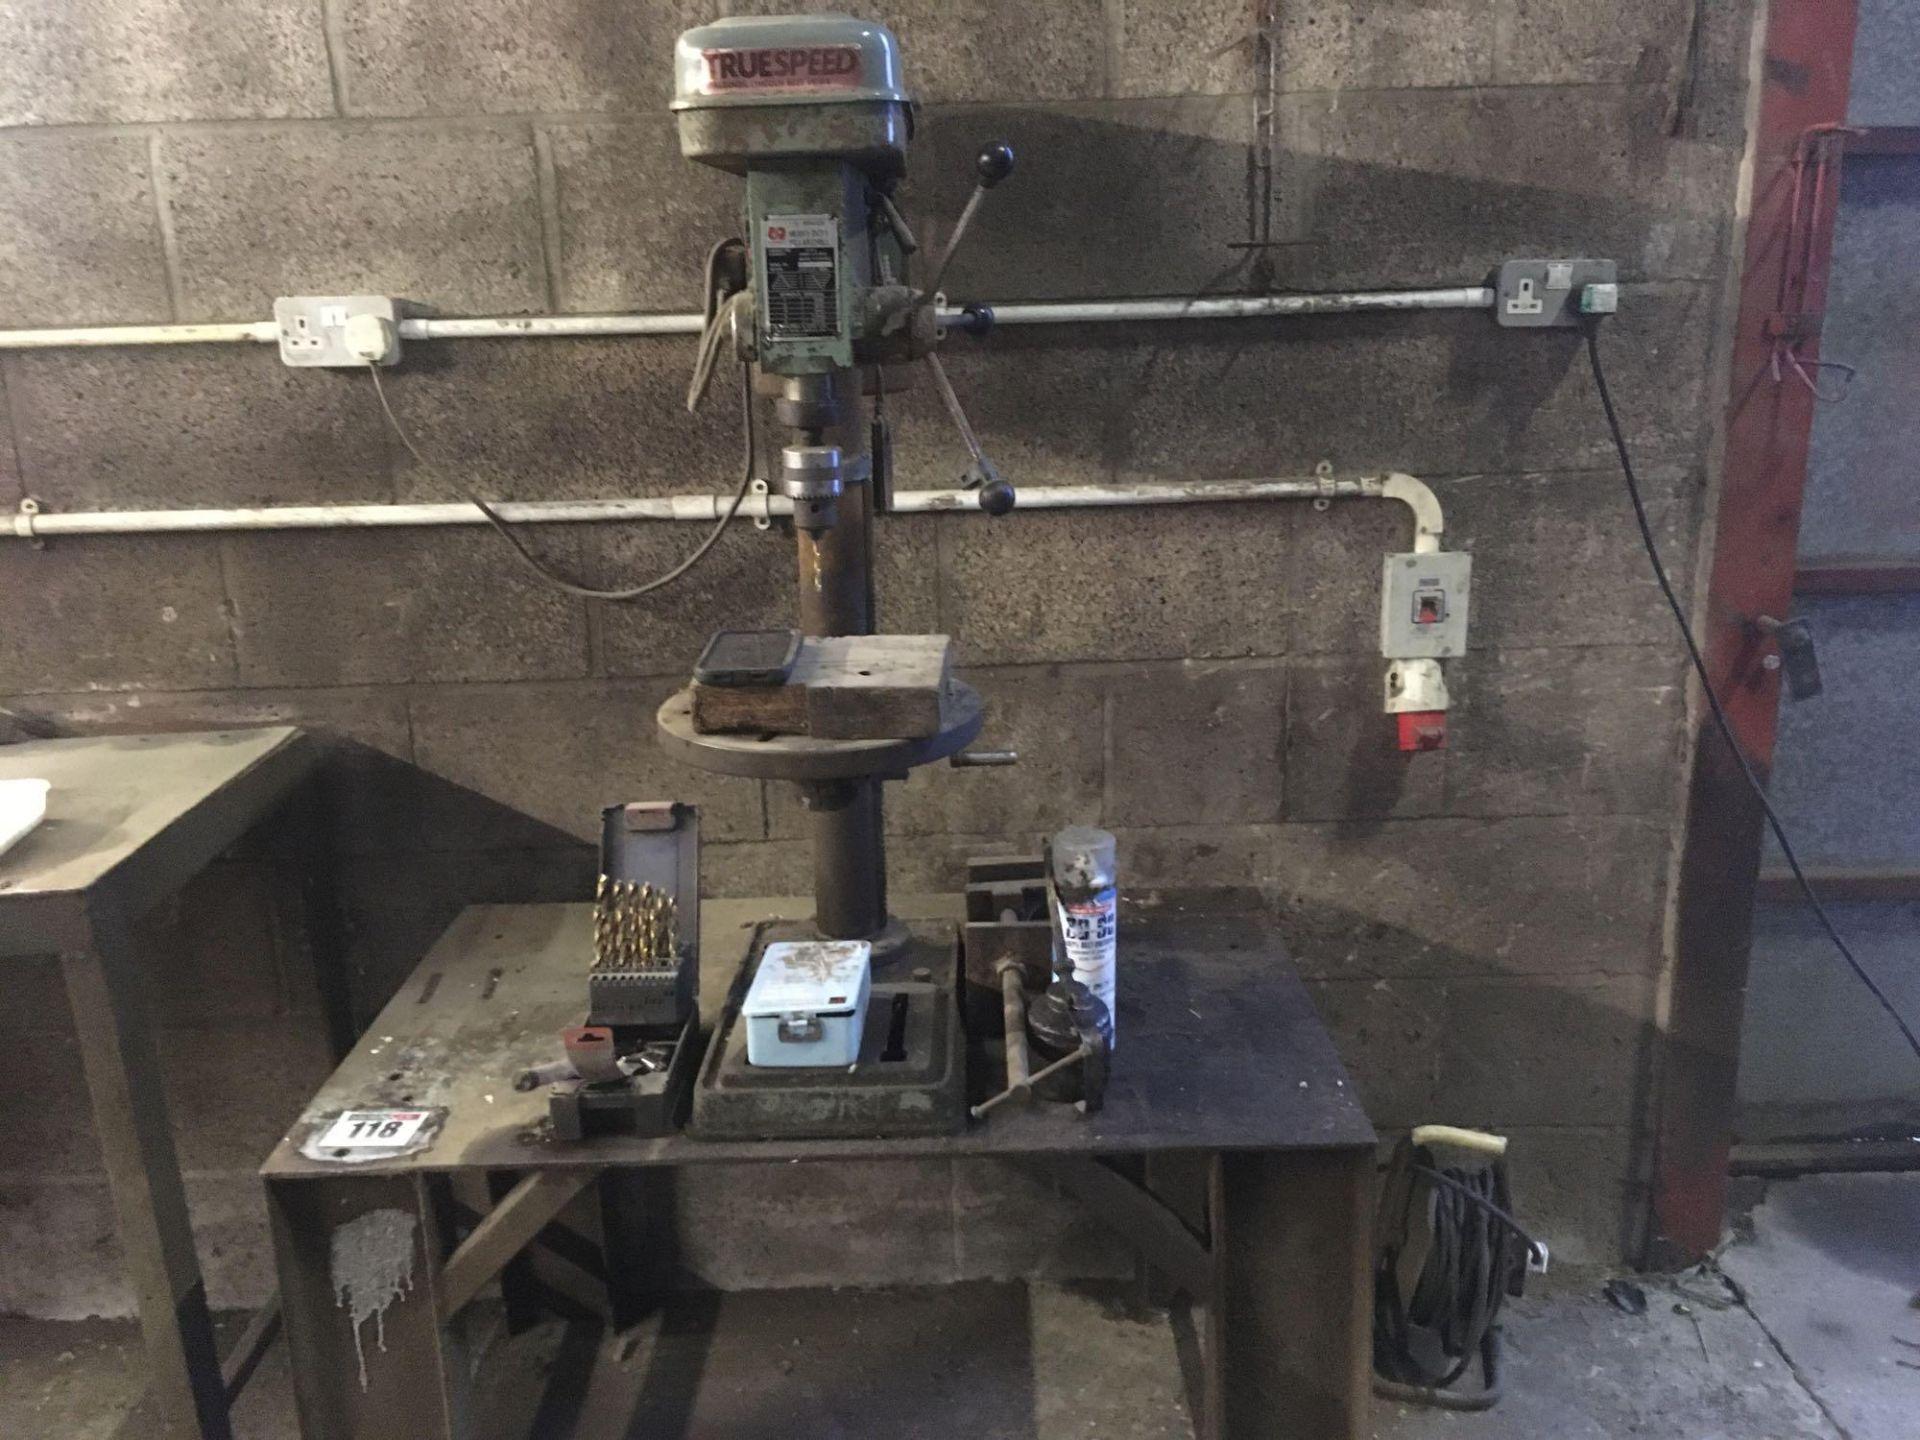 Metal workbench and Truespeed pillar drill